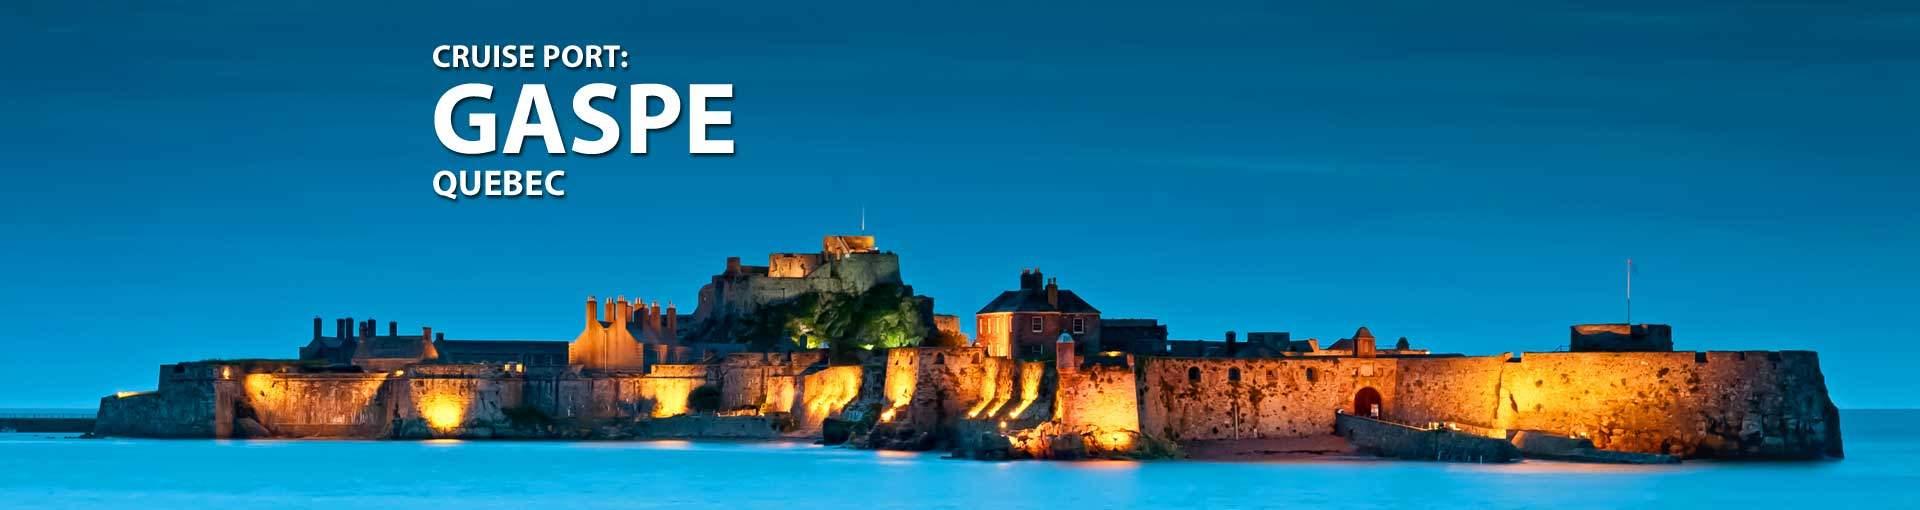 Cruises to Gaspe Quebec